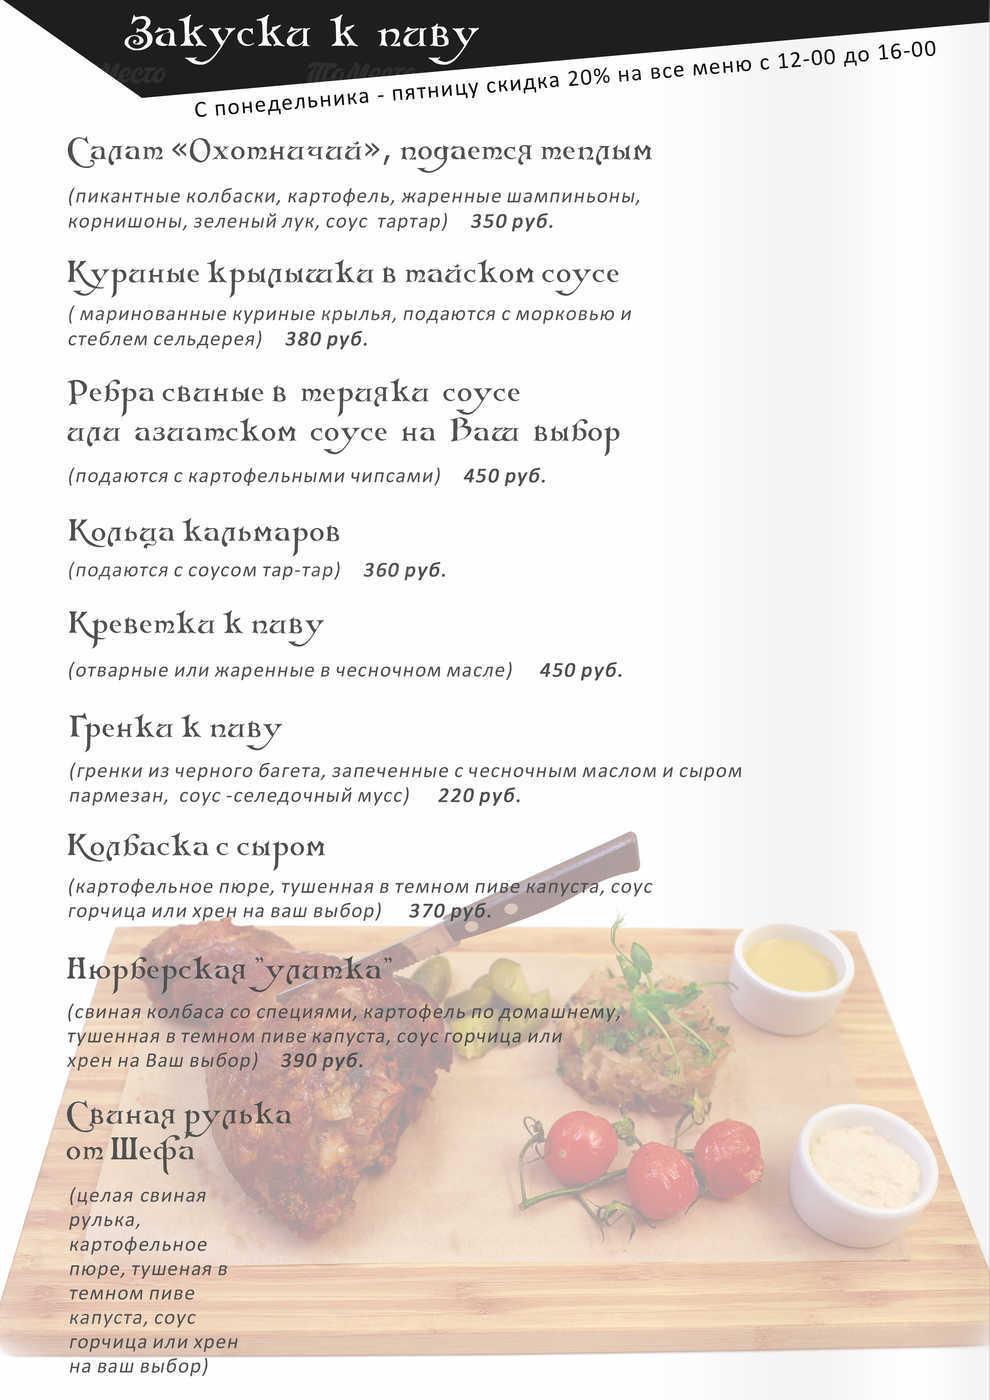 Меню ресторана Z бульвар в Зубовском